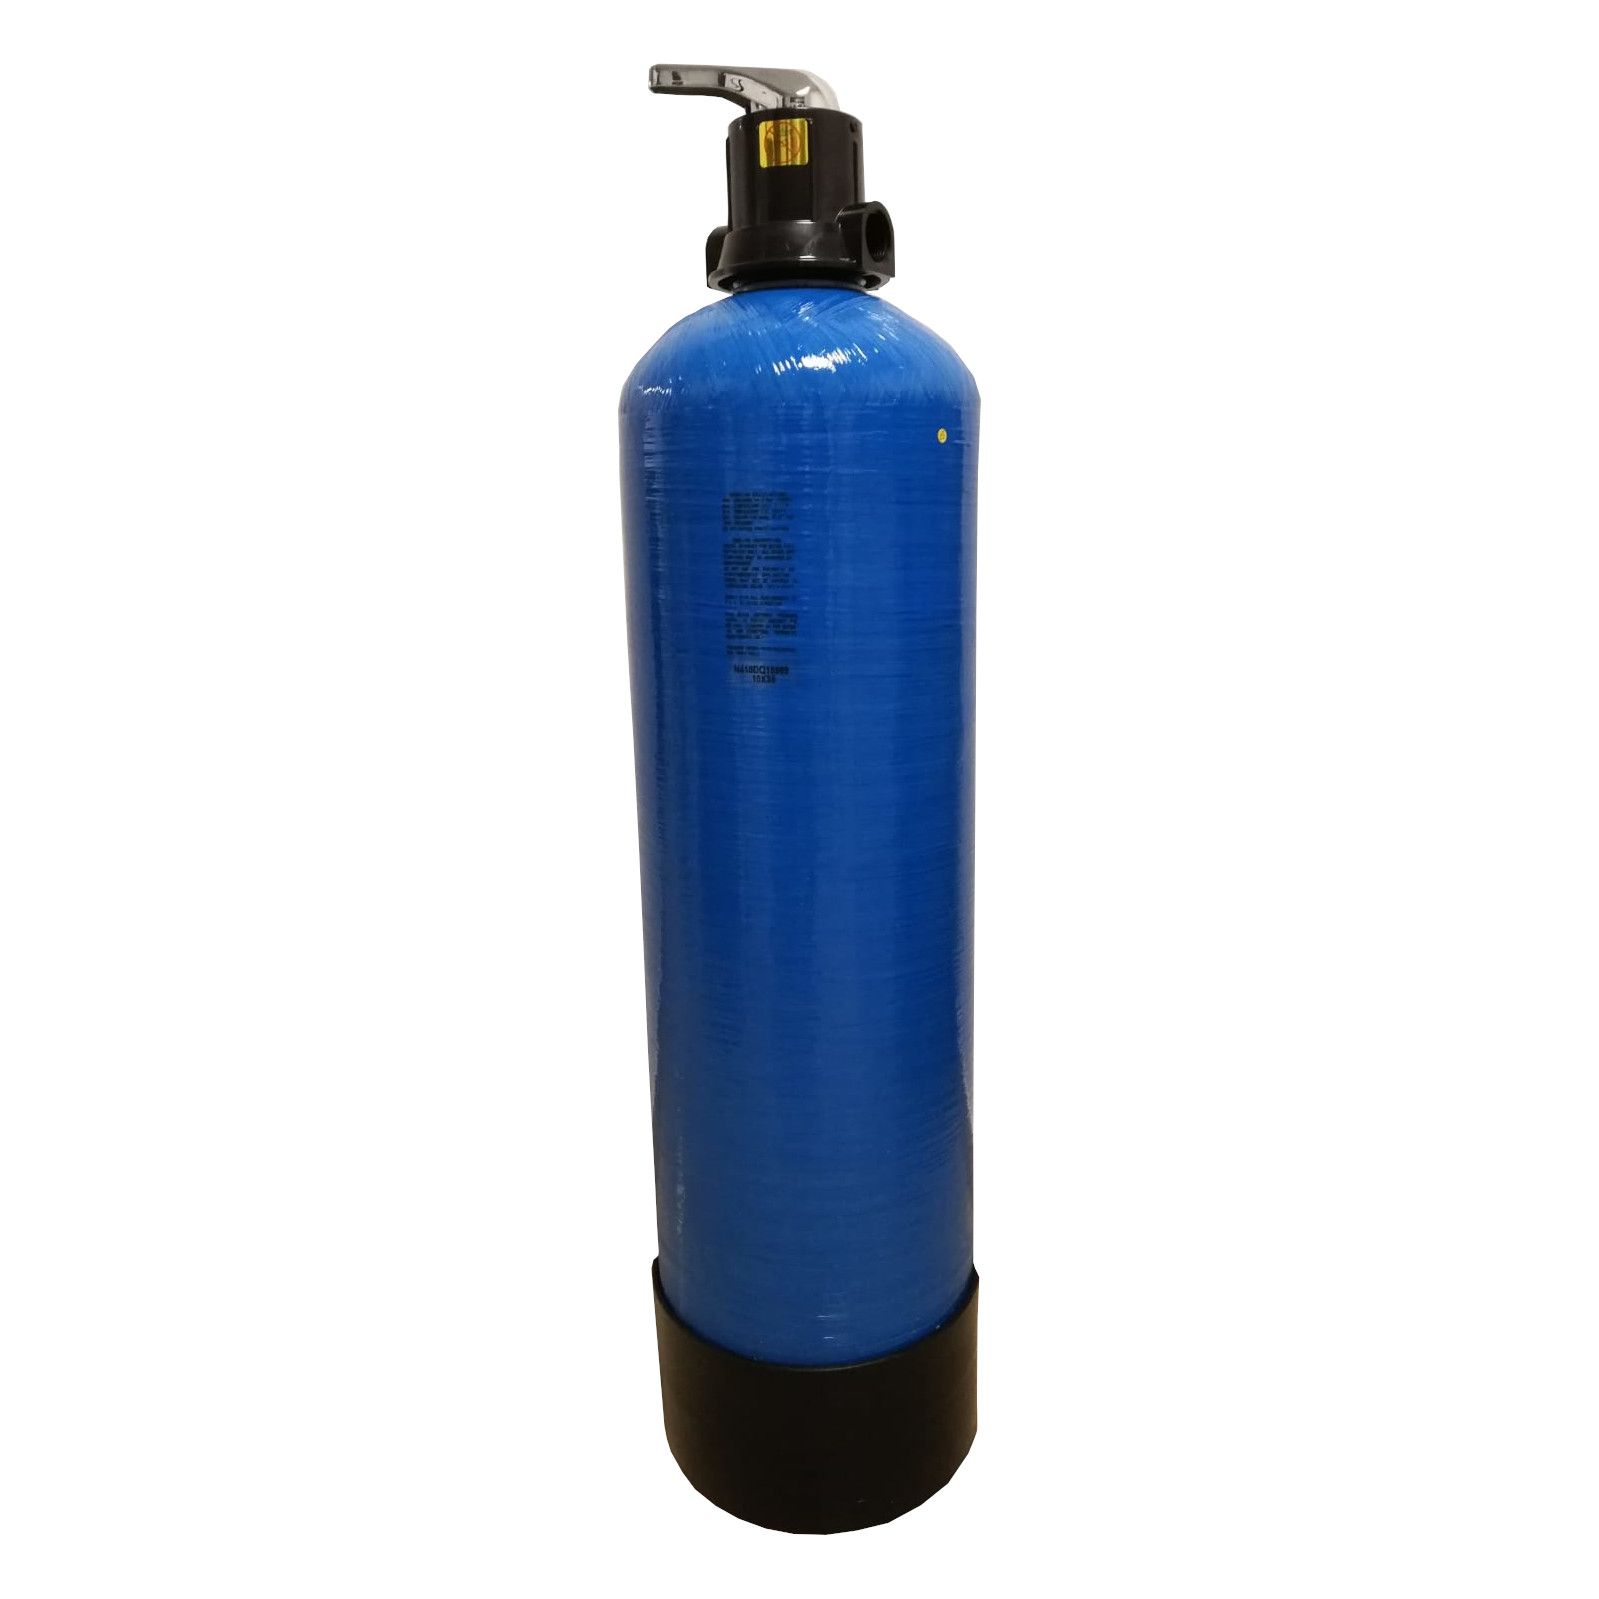 Filtru apa automat cu zeolit Aqua VM 25-DN32, Debit 2.0 mc/h, Capacitate filtrare 40.000 litri, Cartus din Rasina  - AquaFilters.ro